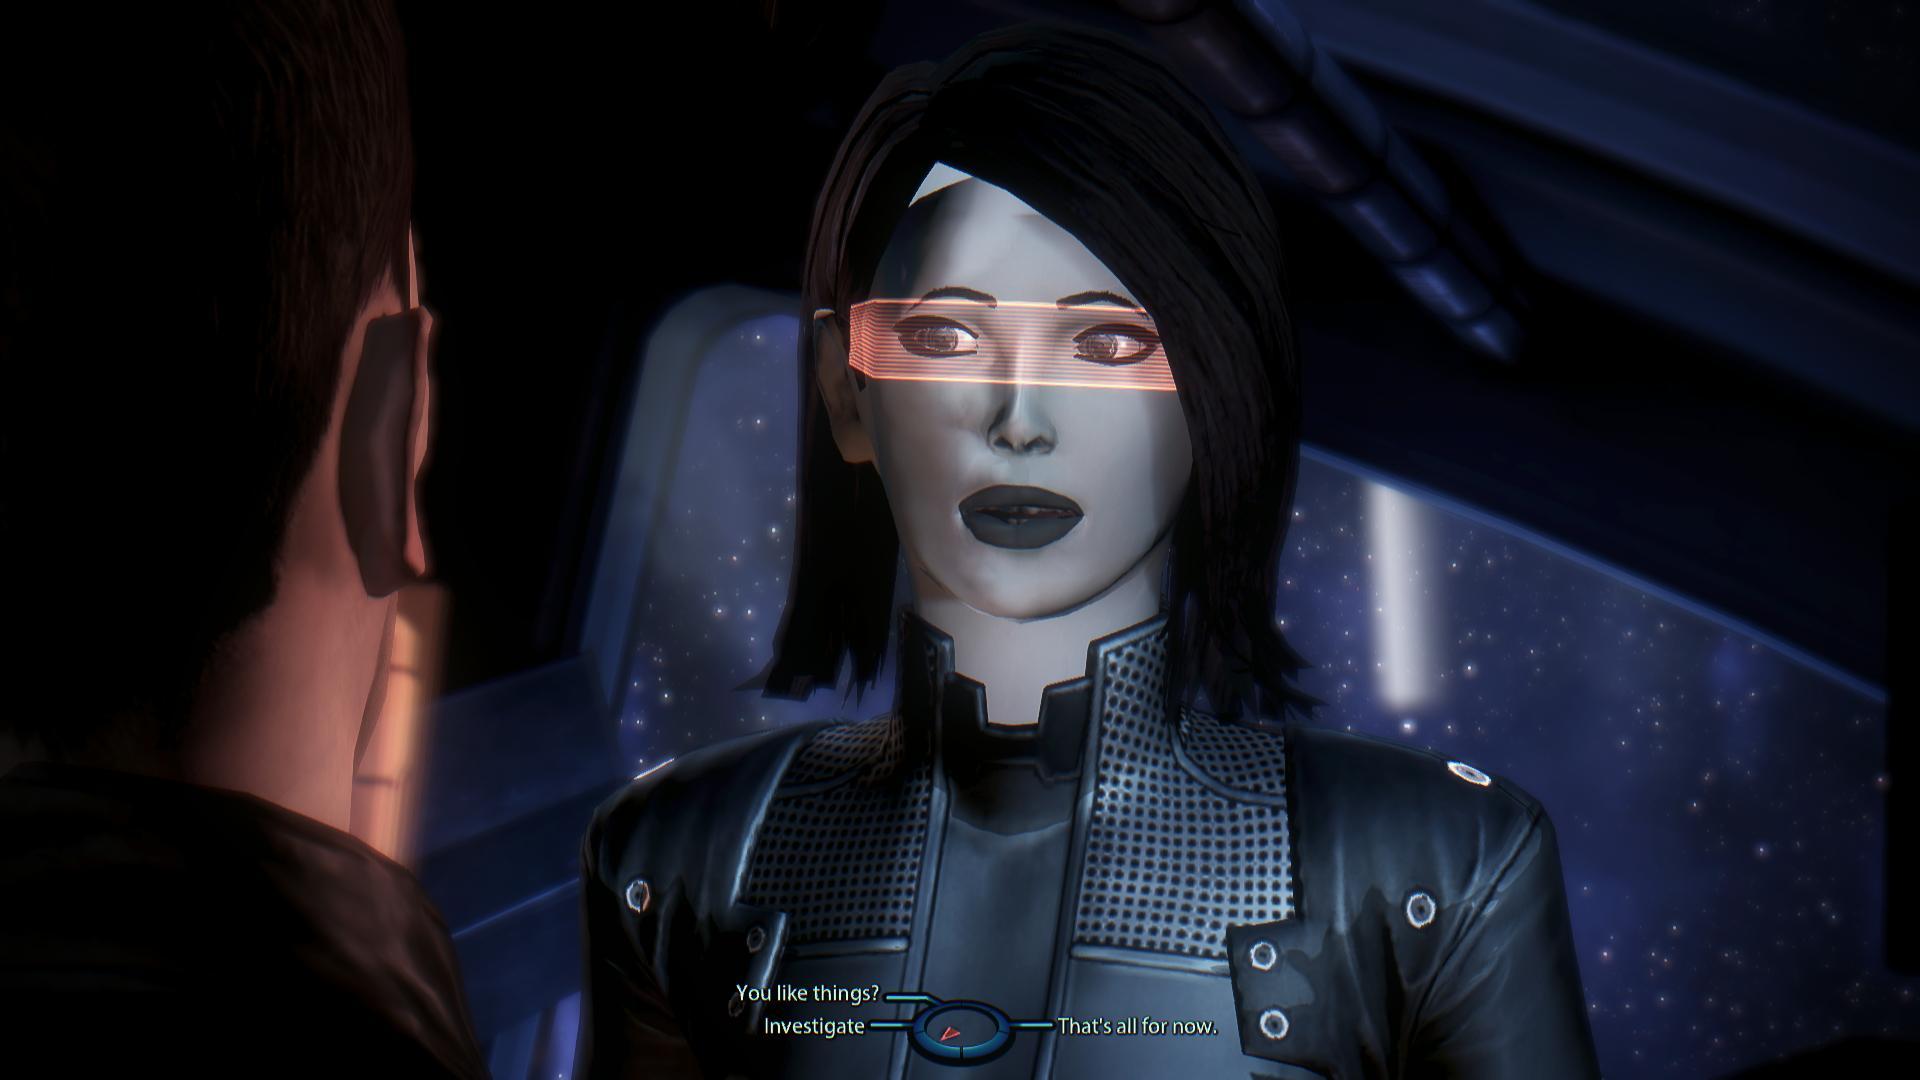 Edi Mass Effect edi head mod for mass effect 3 - mod db